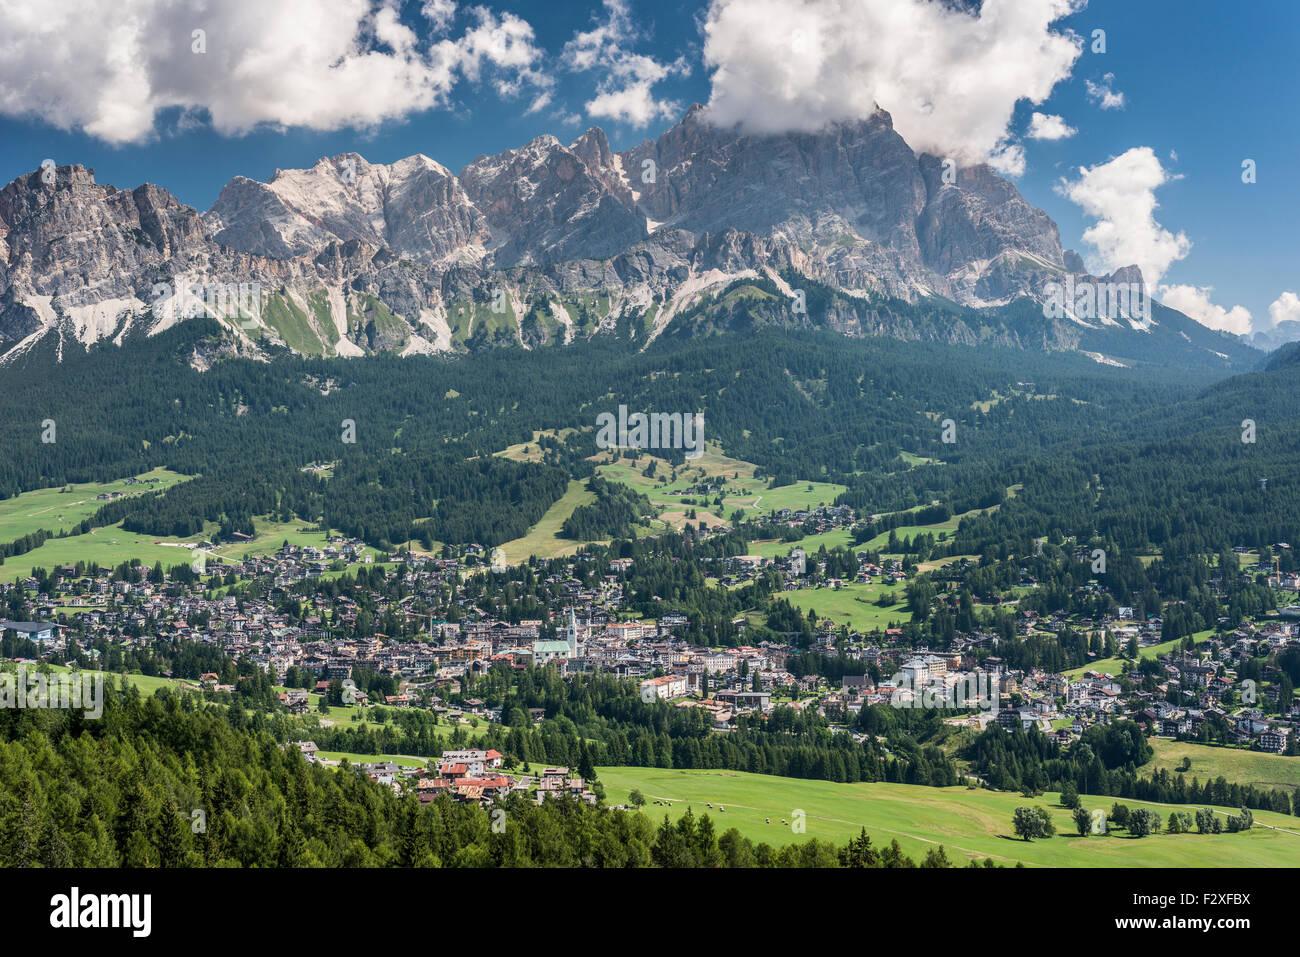 View towards Cortina d'Ampezzo, Cristallo range behind, Ampezzo Dolomites, Alps, Venice, Veneto, Italy - Stock Image